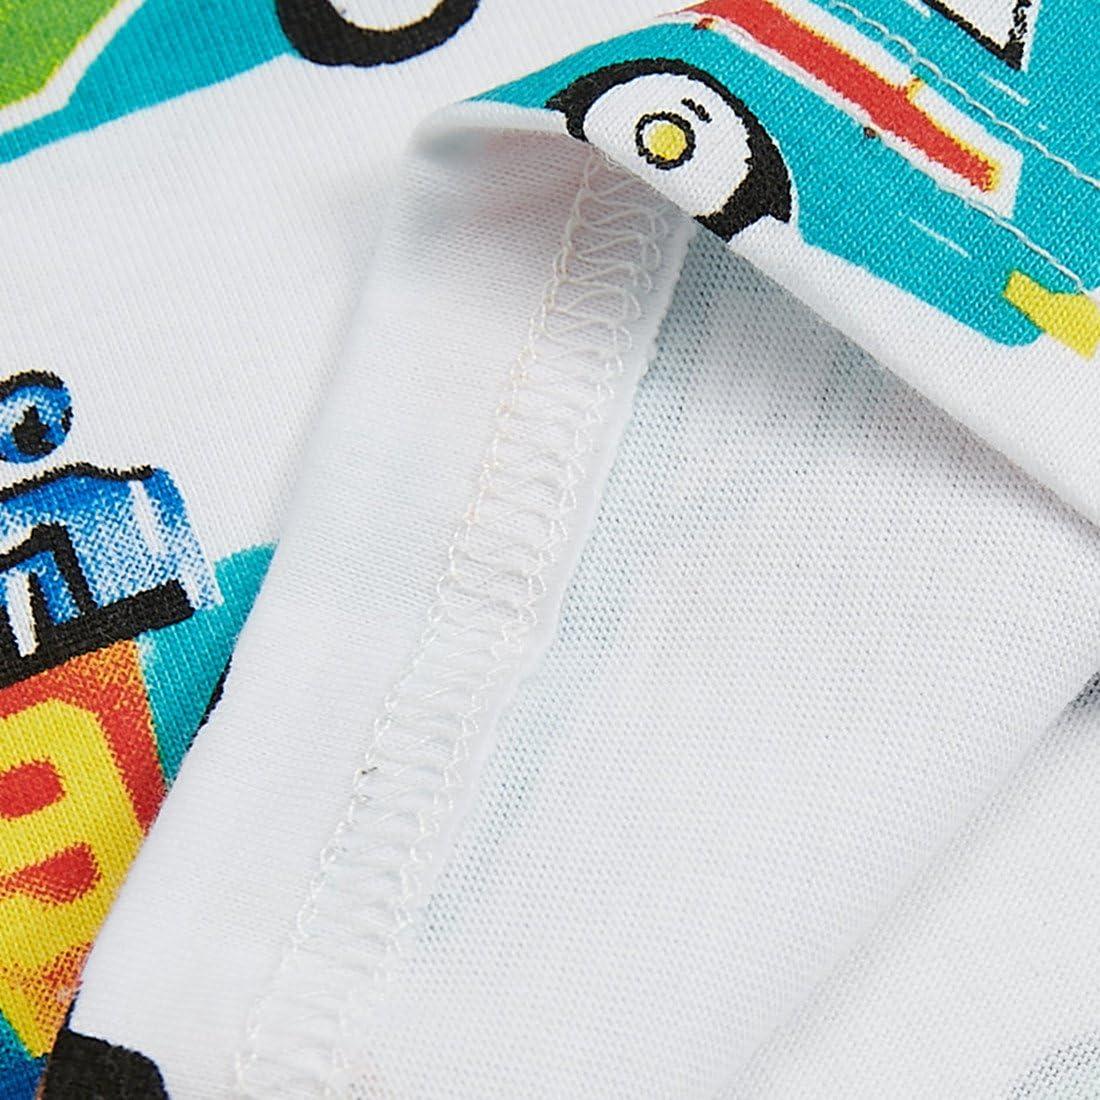 Sooxiwood Little Boys Tank Tops Car Printing Summer